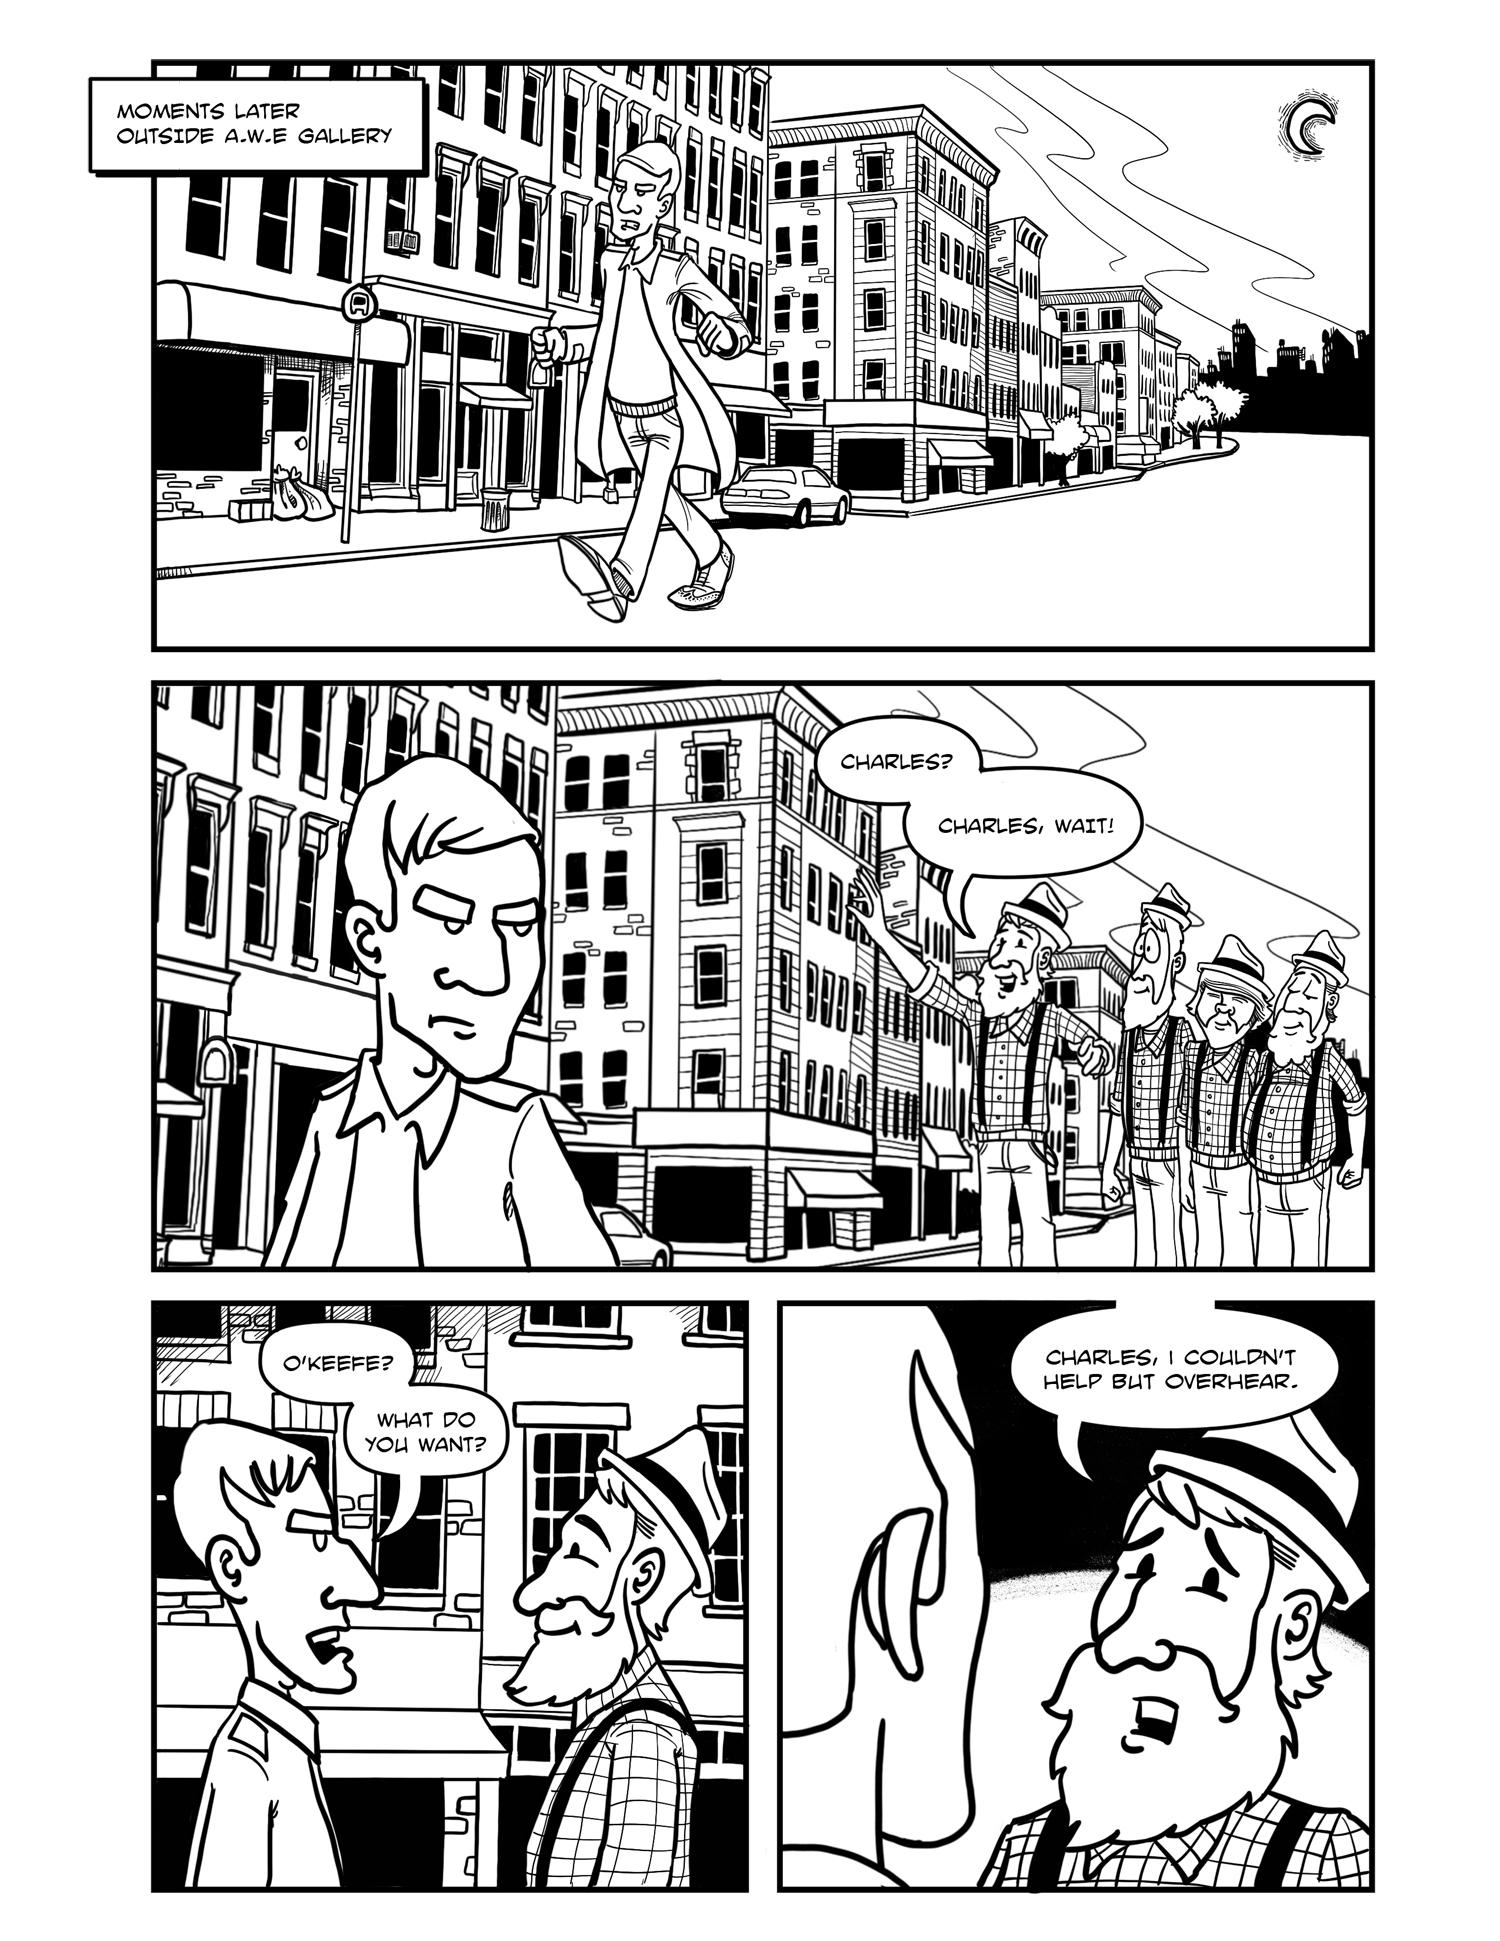 PAGE-158.jpg